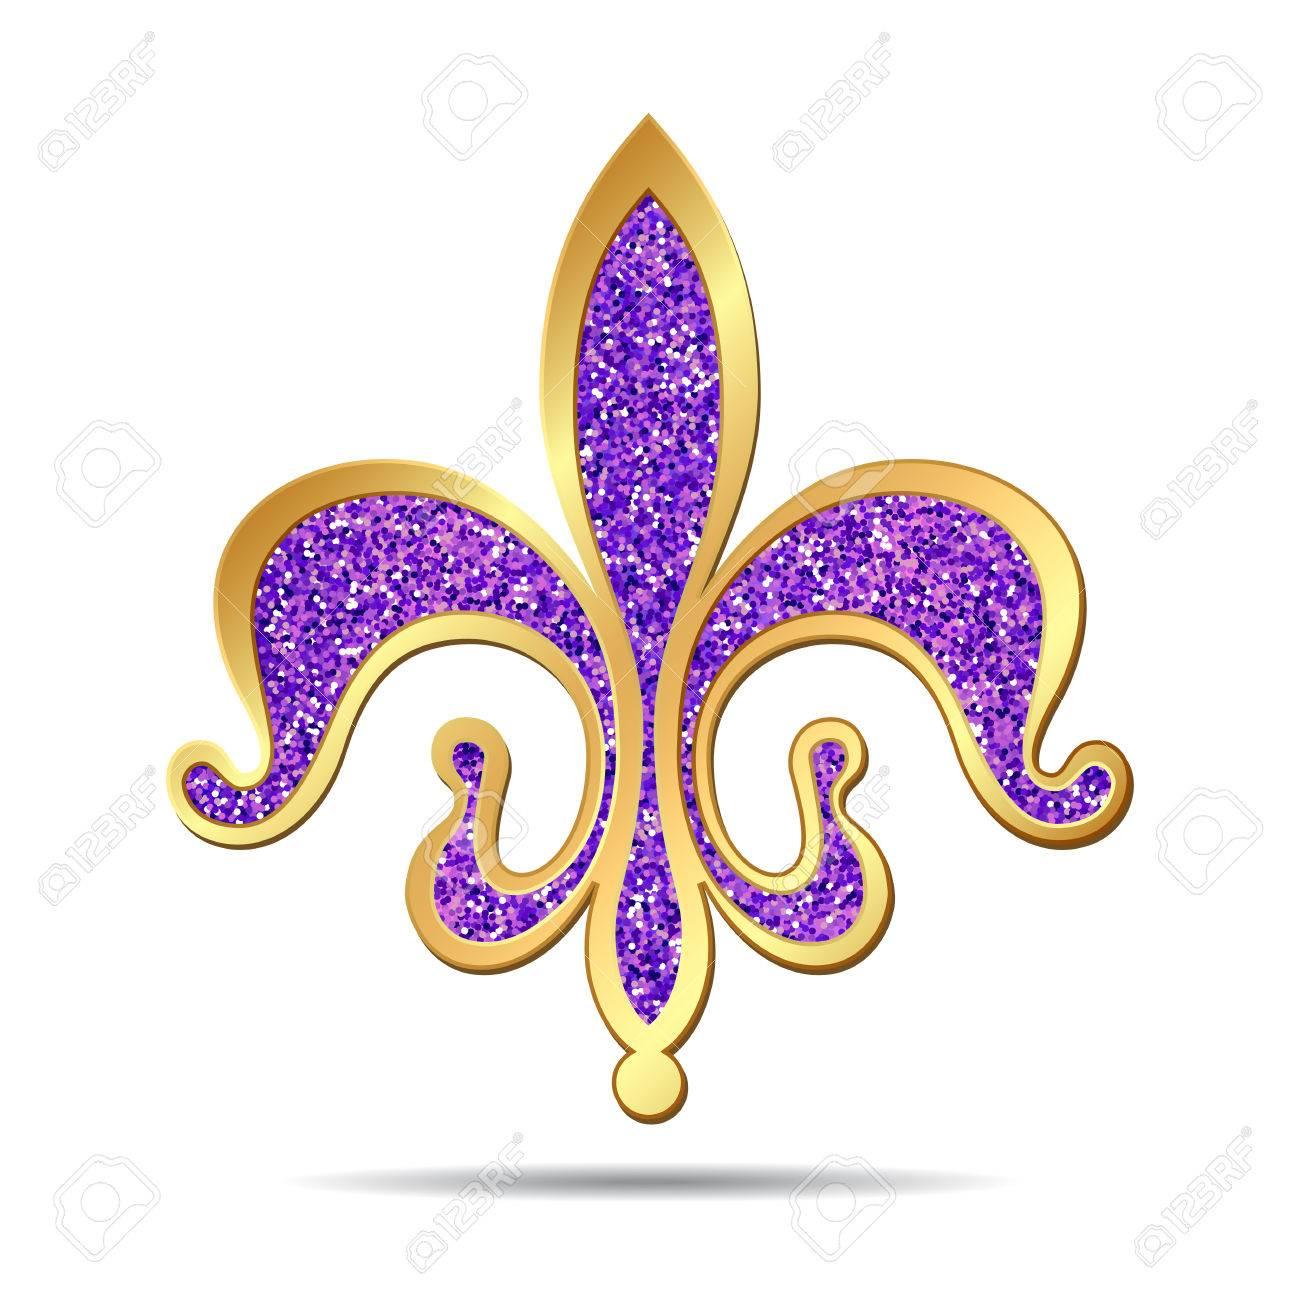 Golden and purple fleur-de-lis decorative design or heraldic symbol. illustration - 58420916